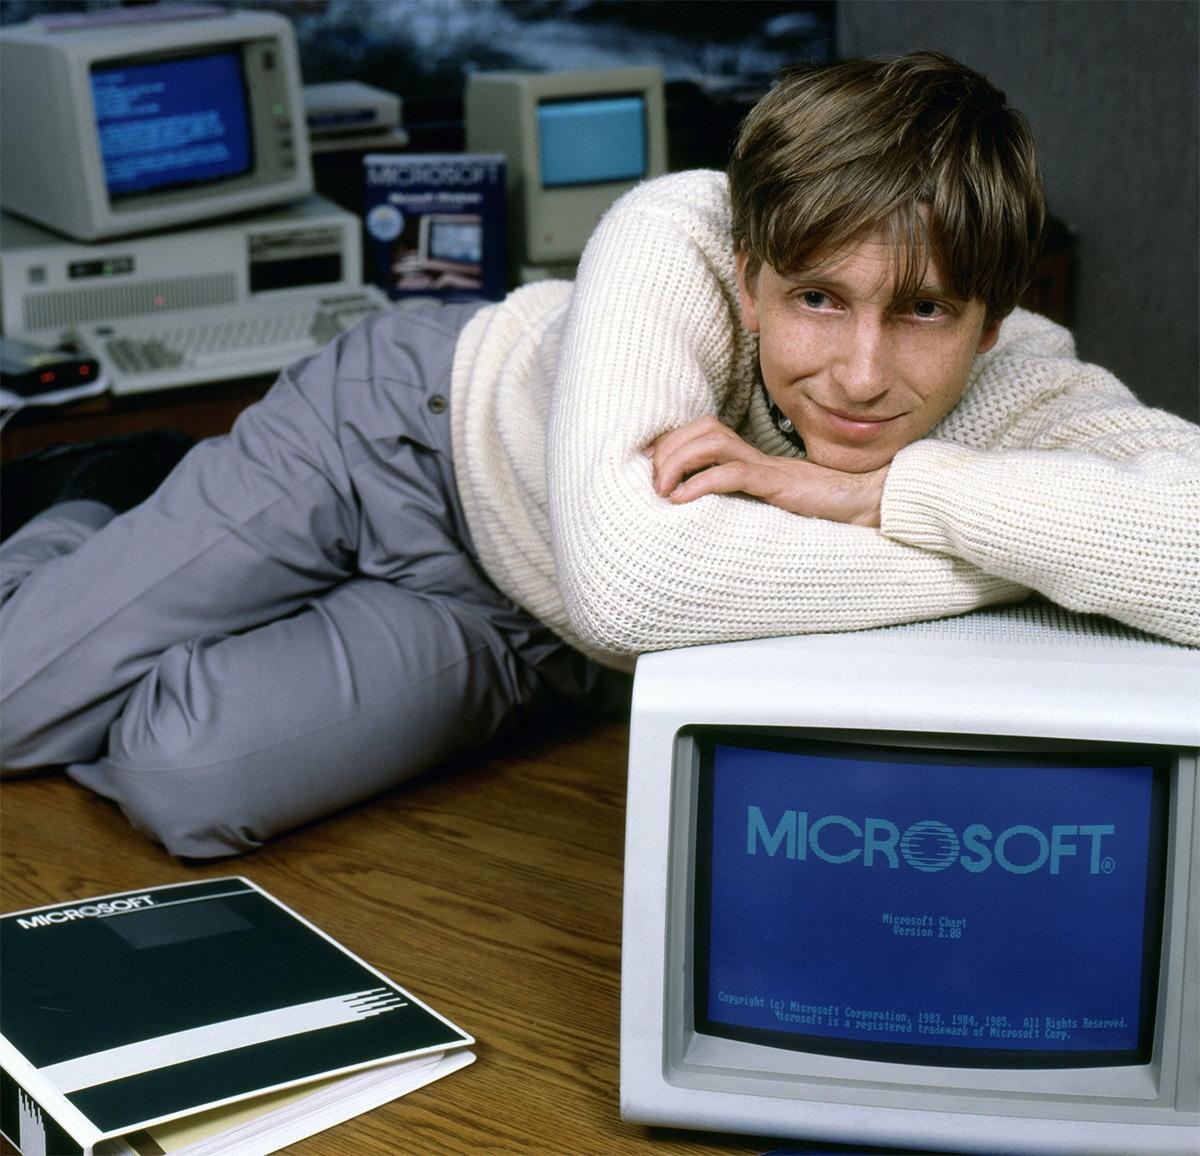 Windows 2.0 Bill Gates